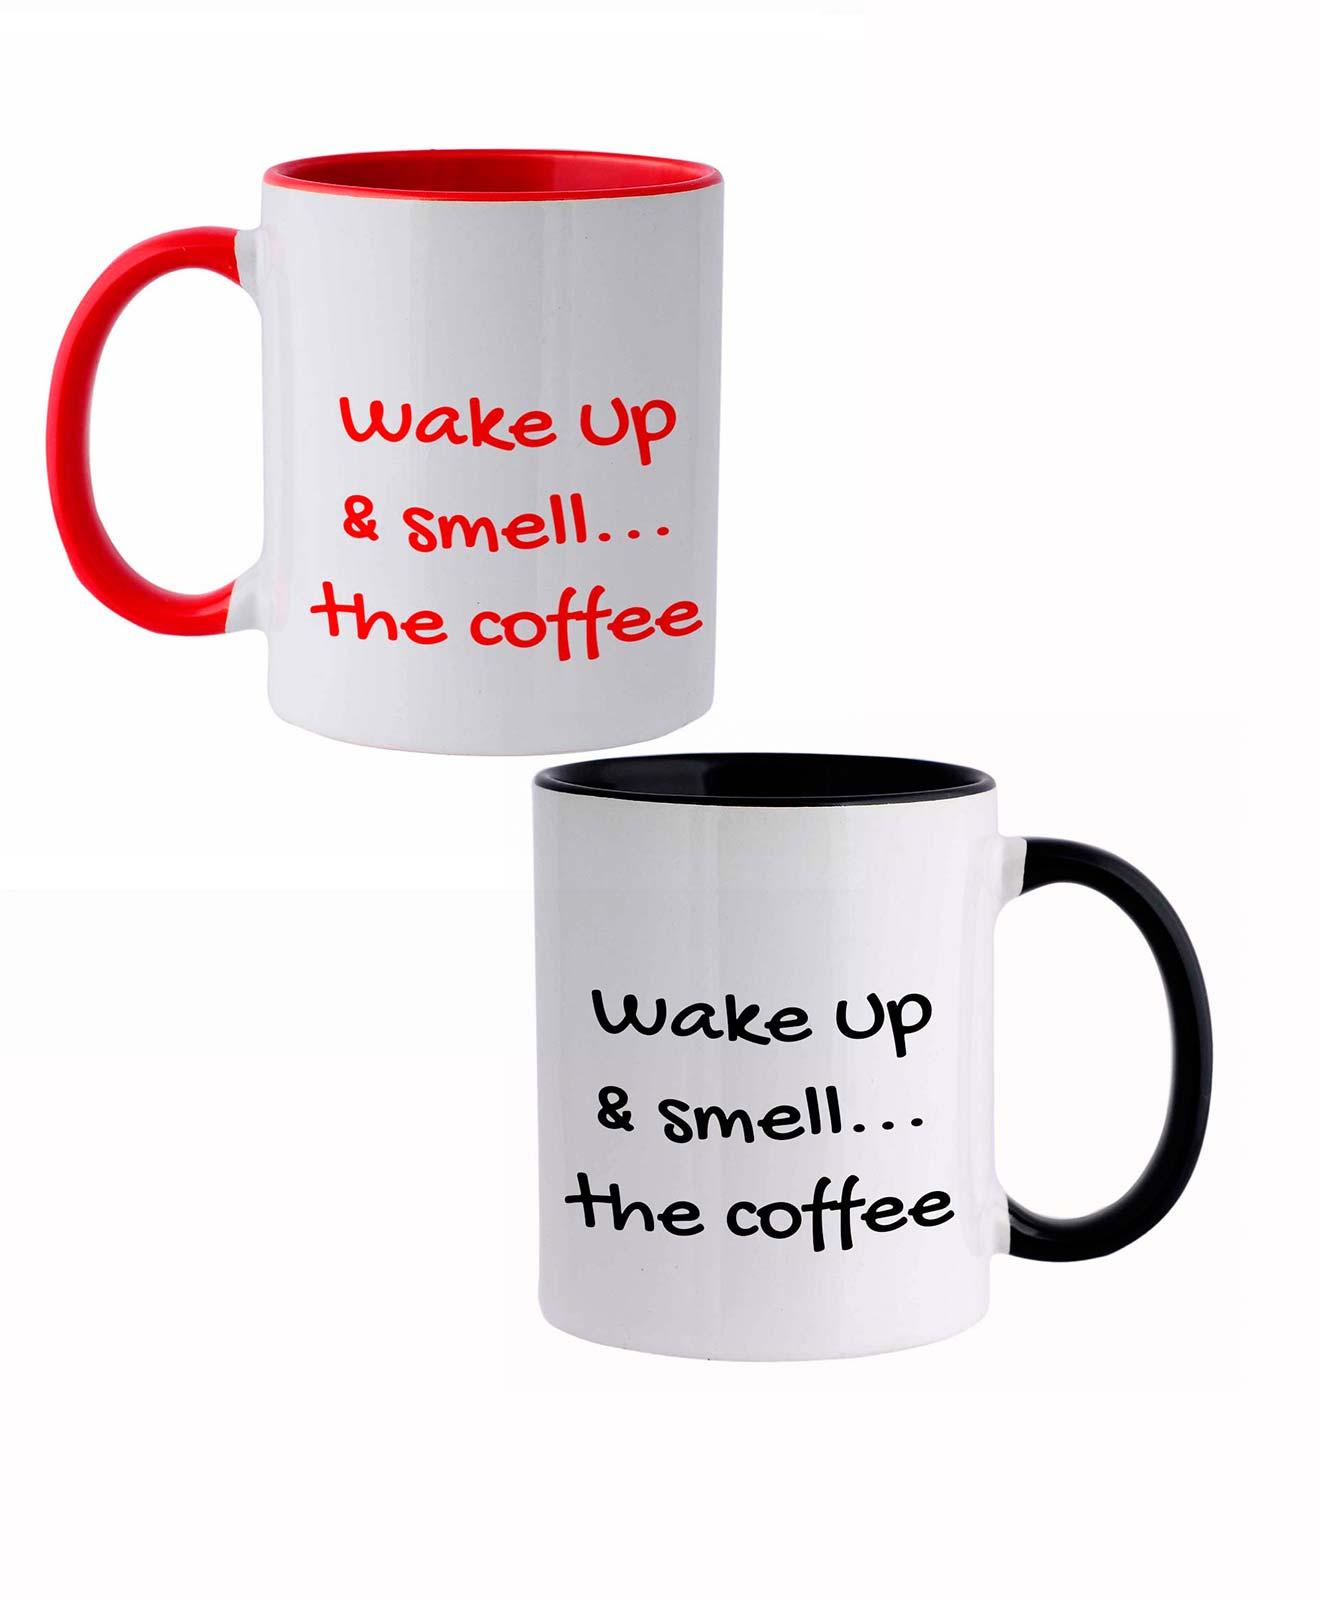 Wake Up and Smell the Coffee Ceramic White Mug set